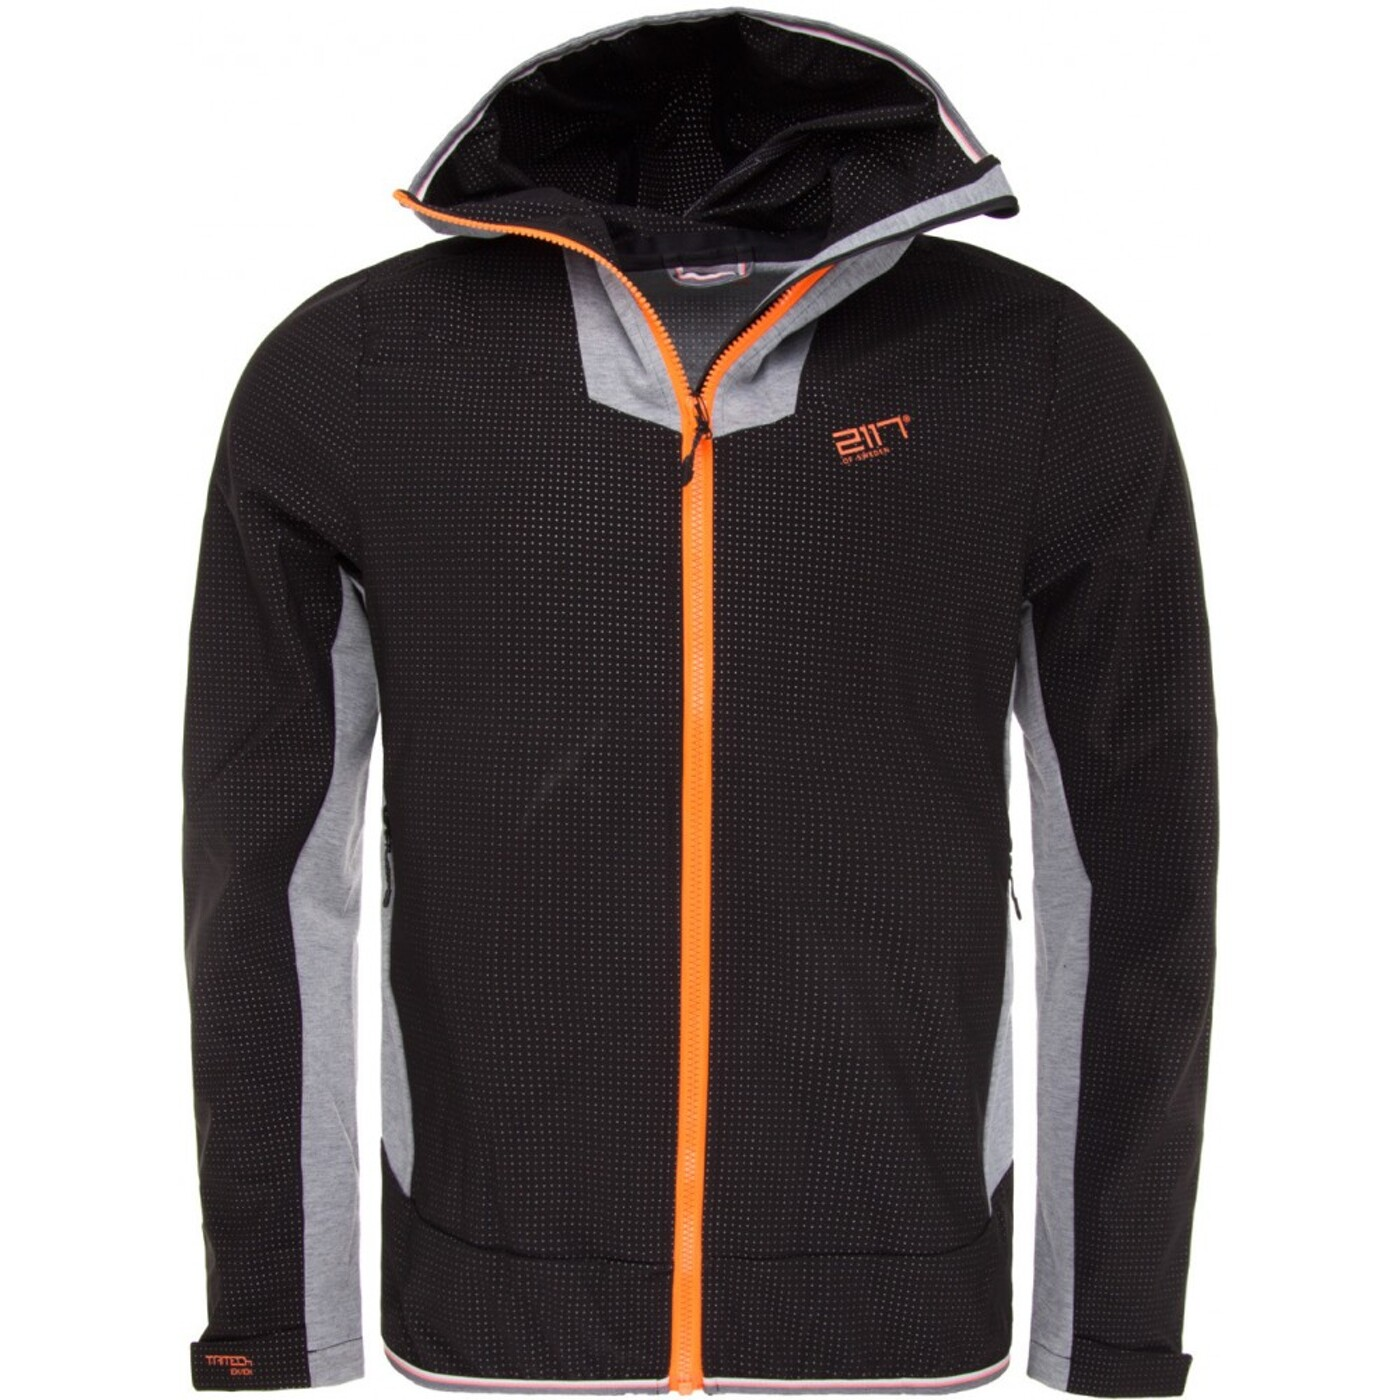 STYLE 2117 Funktionsjacke Mens Eco softshell jacket Invik 2117 - Herren